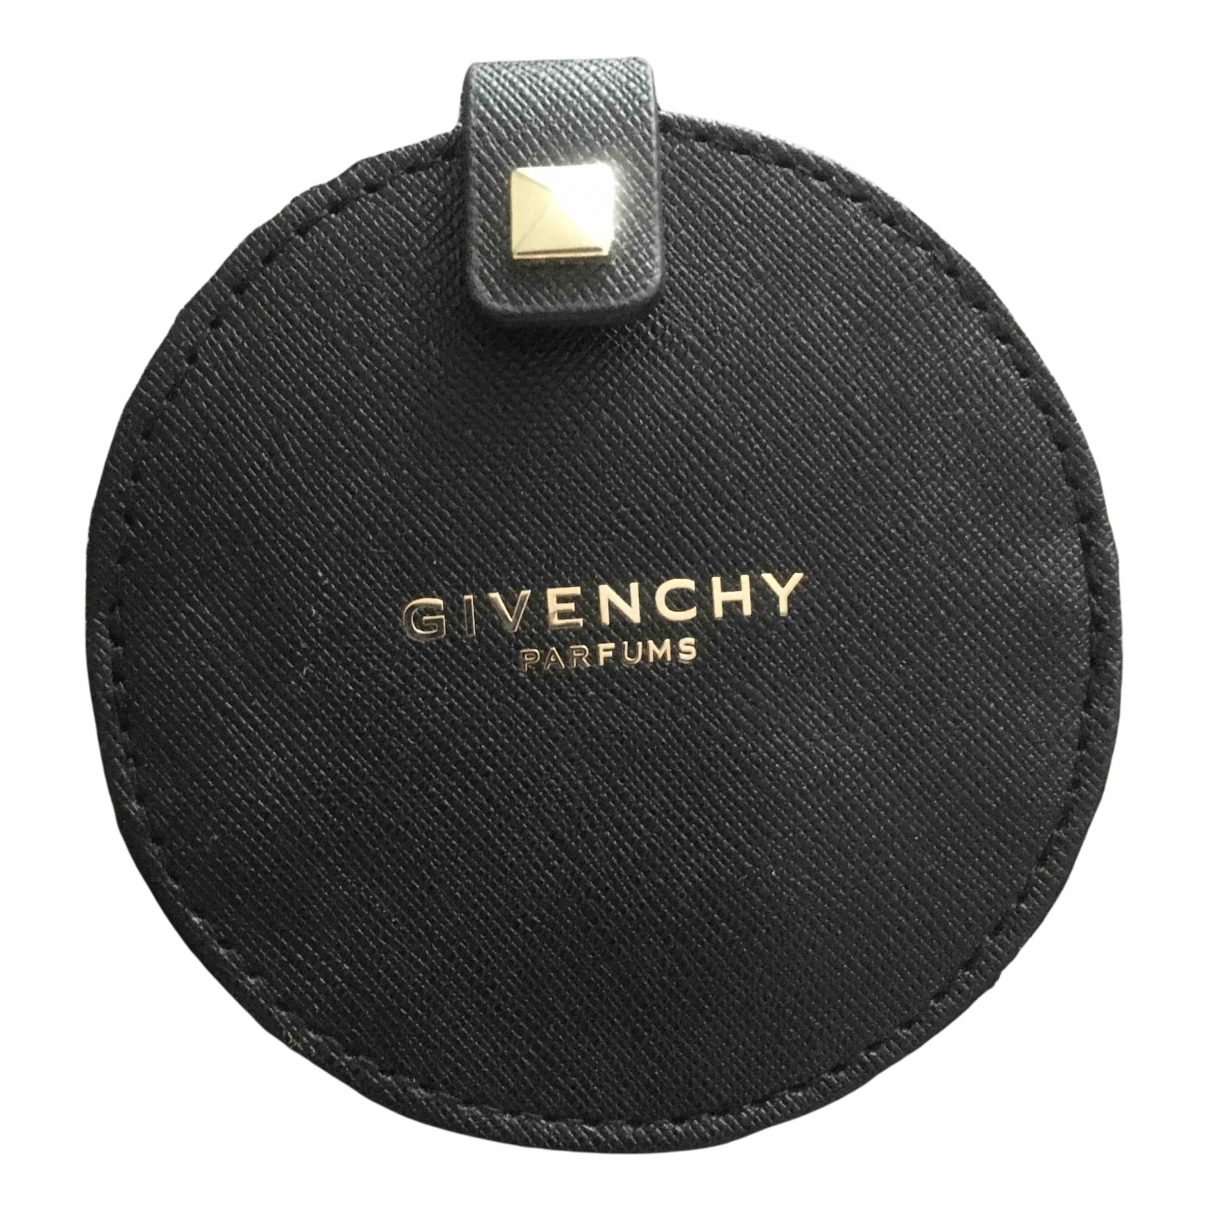 Givenchy \N Kleinlederwaren in  Schwarz Synthetik